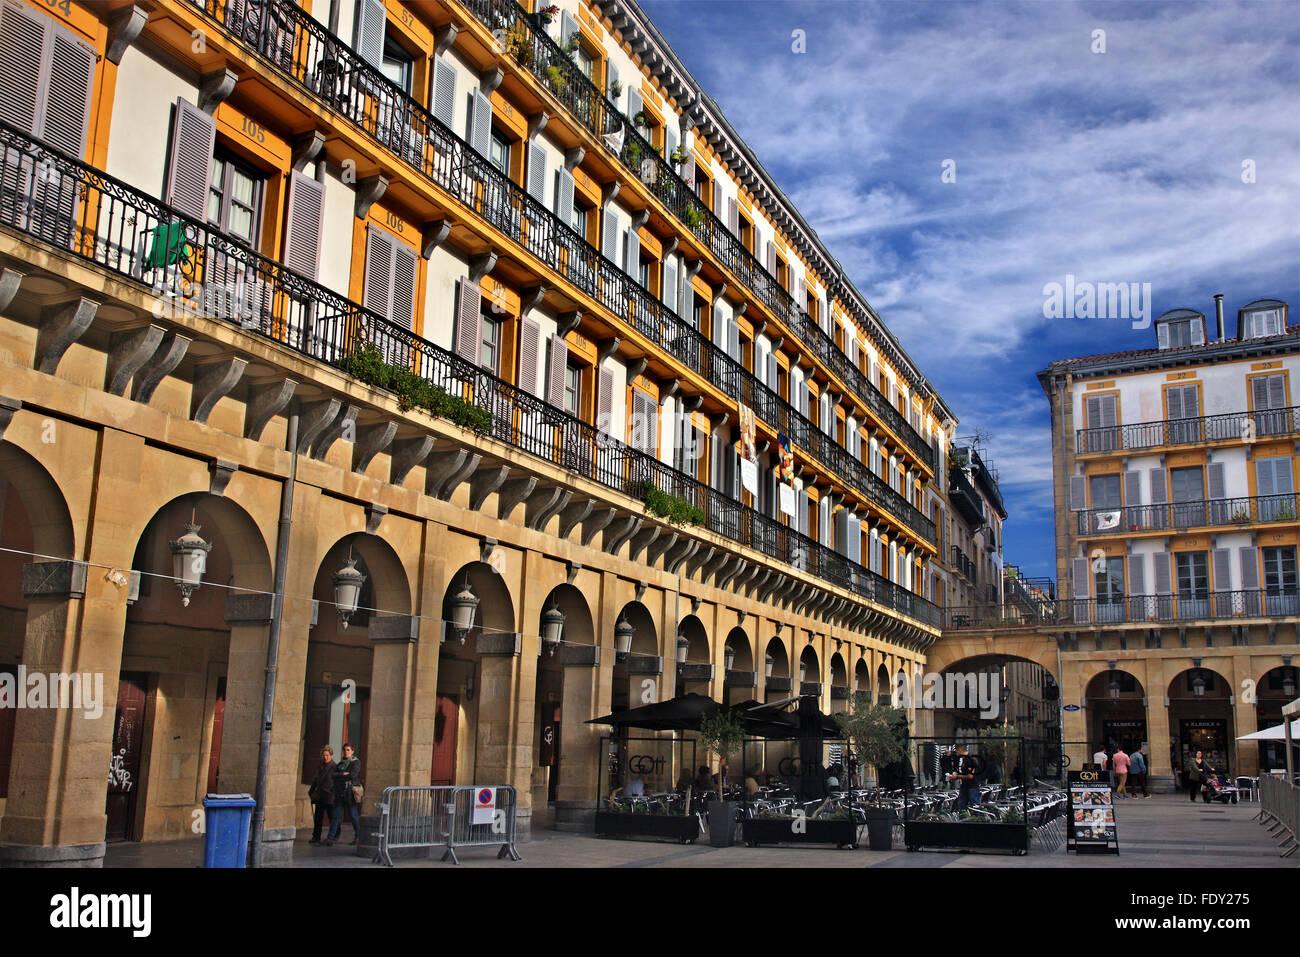 Plaza de la Constitucion, San Sebastian (Donostia), Basque Country (Pais Vasco - Euskadi), Spain - Stock Image